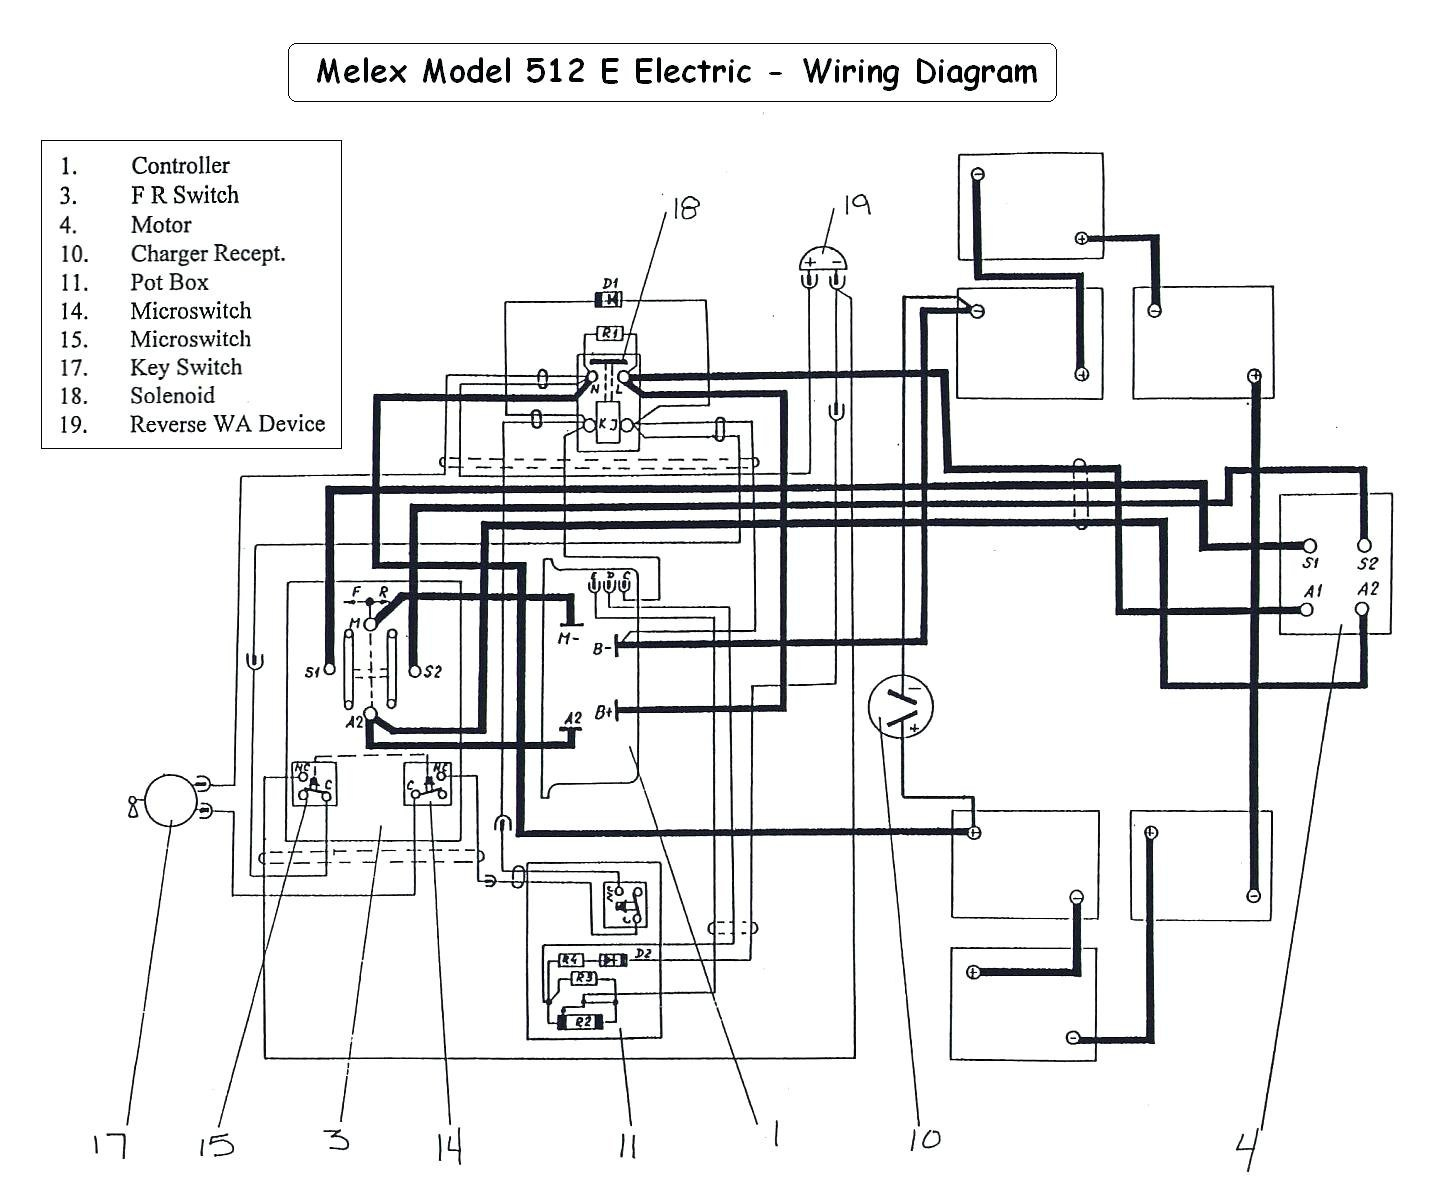 Cushman Golf Cart 36 Volt Wiring Diagram 1974 To | Wiring Library - Ez Go Golf Cart Battery Wiring Diagram